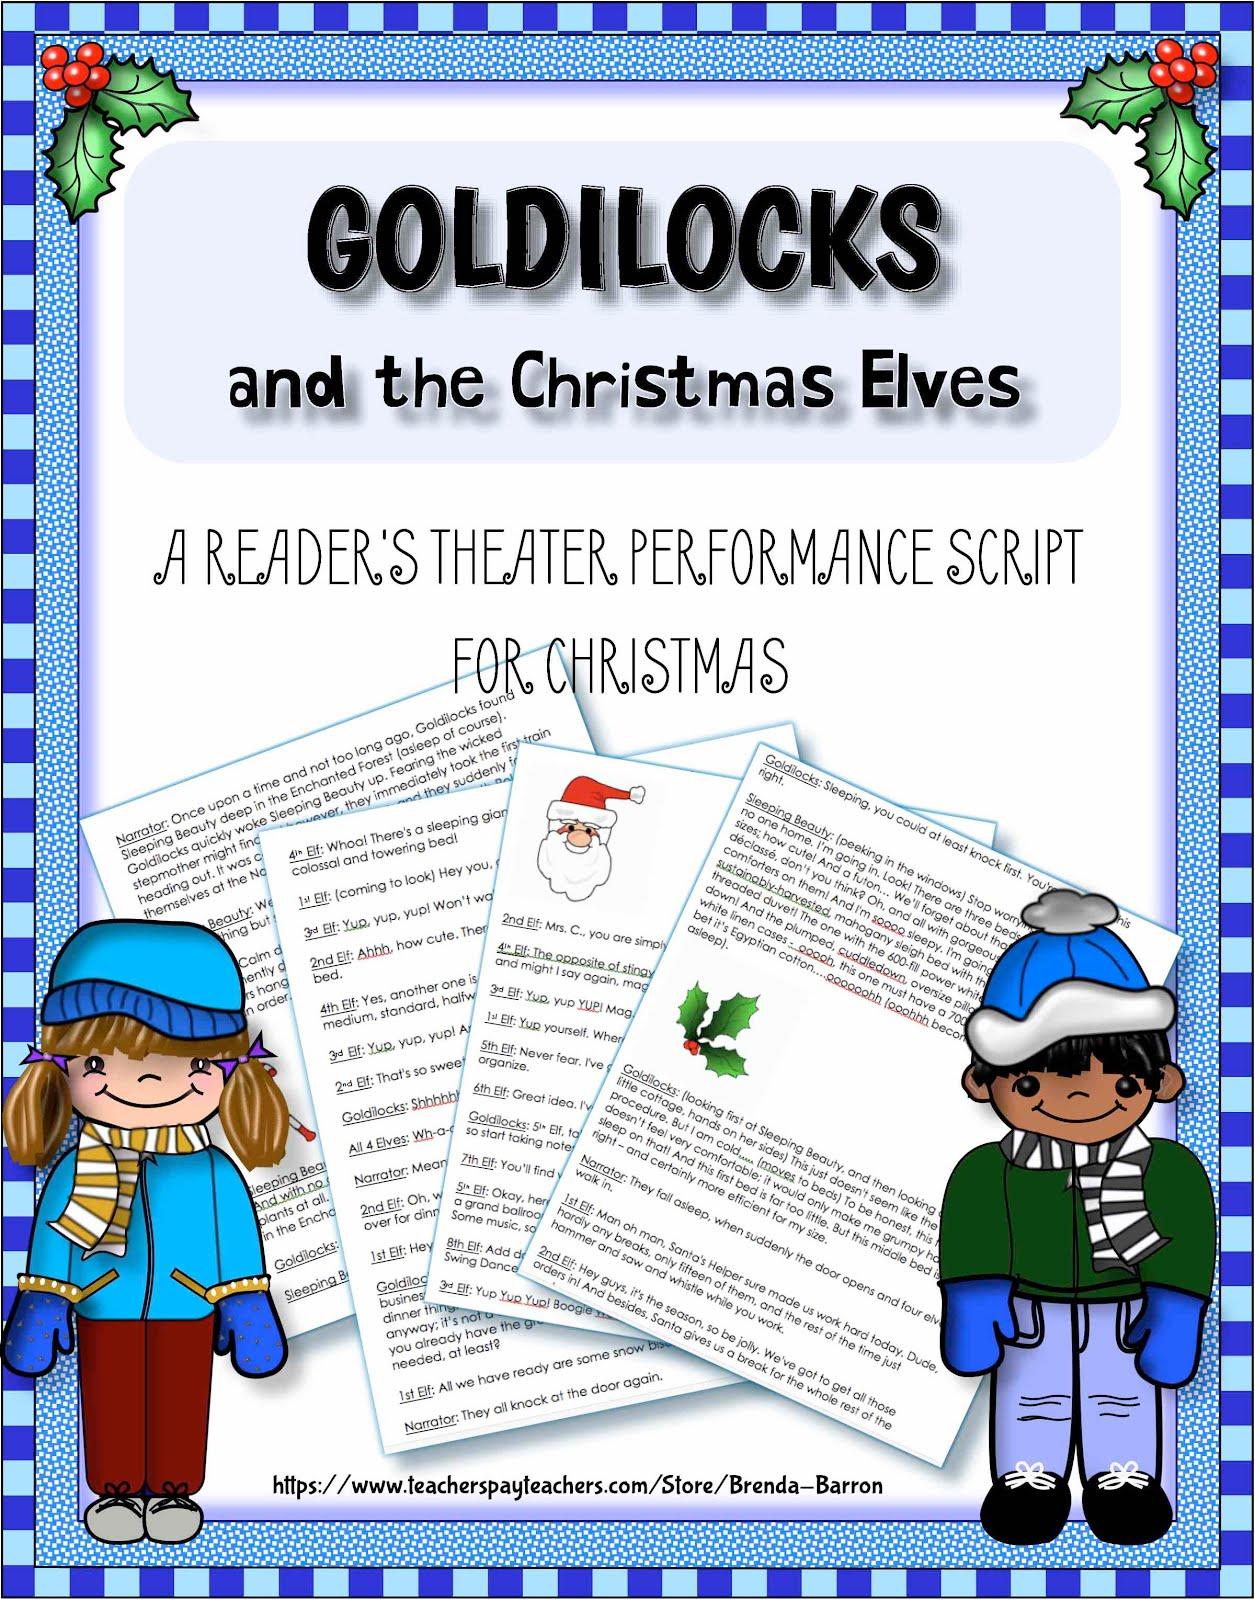 The Classroom Flyer